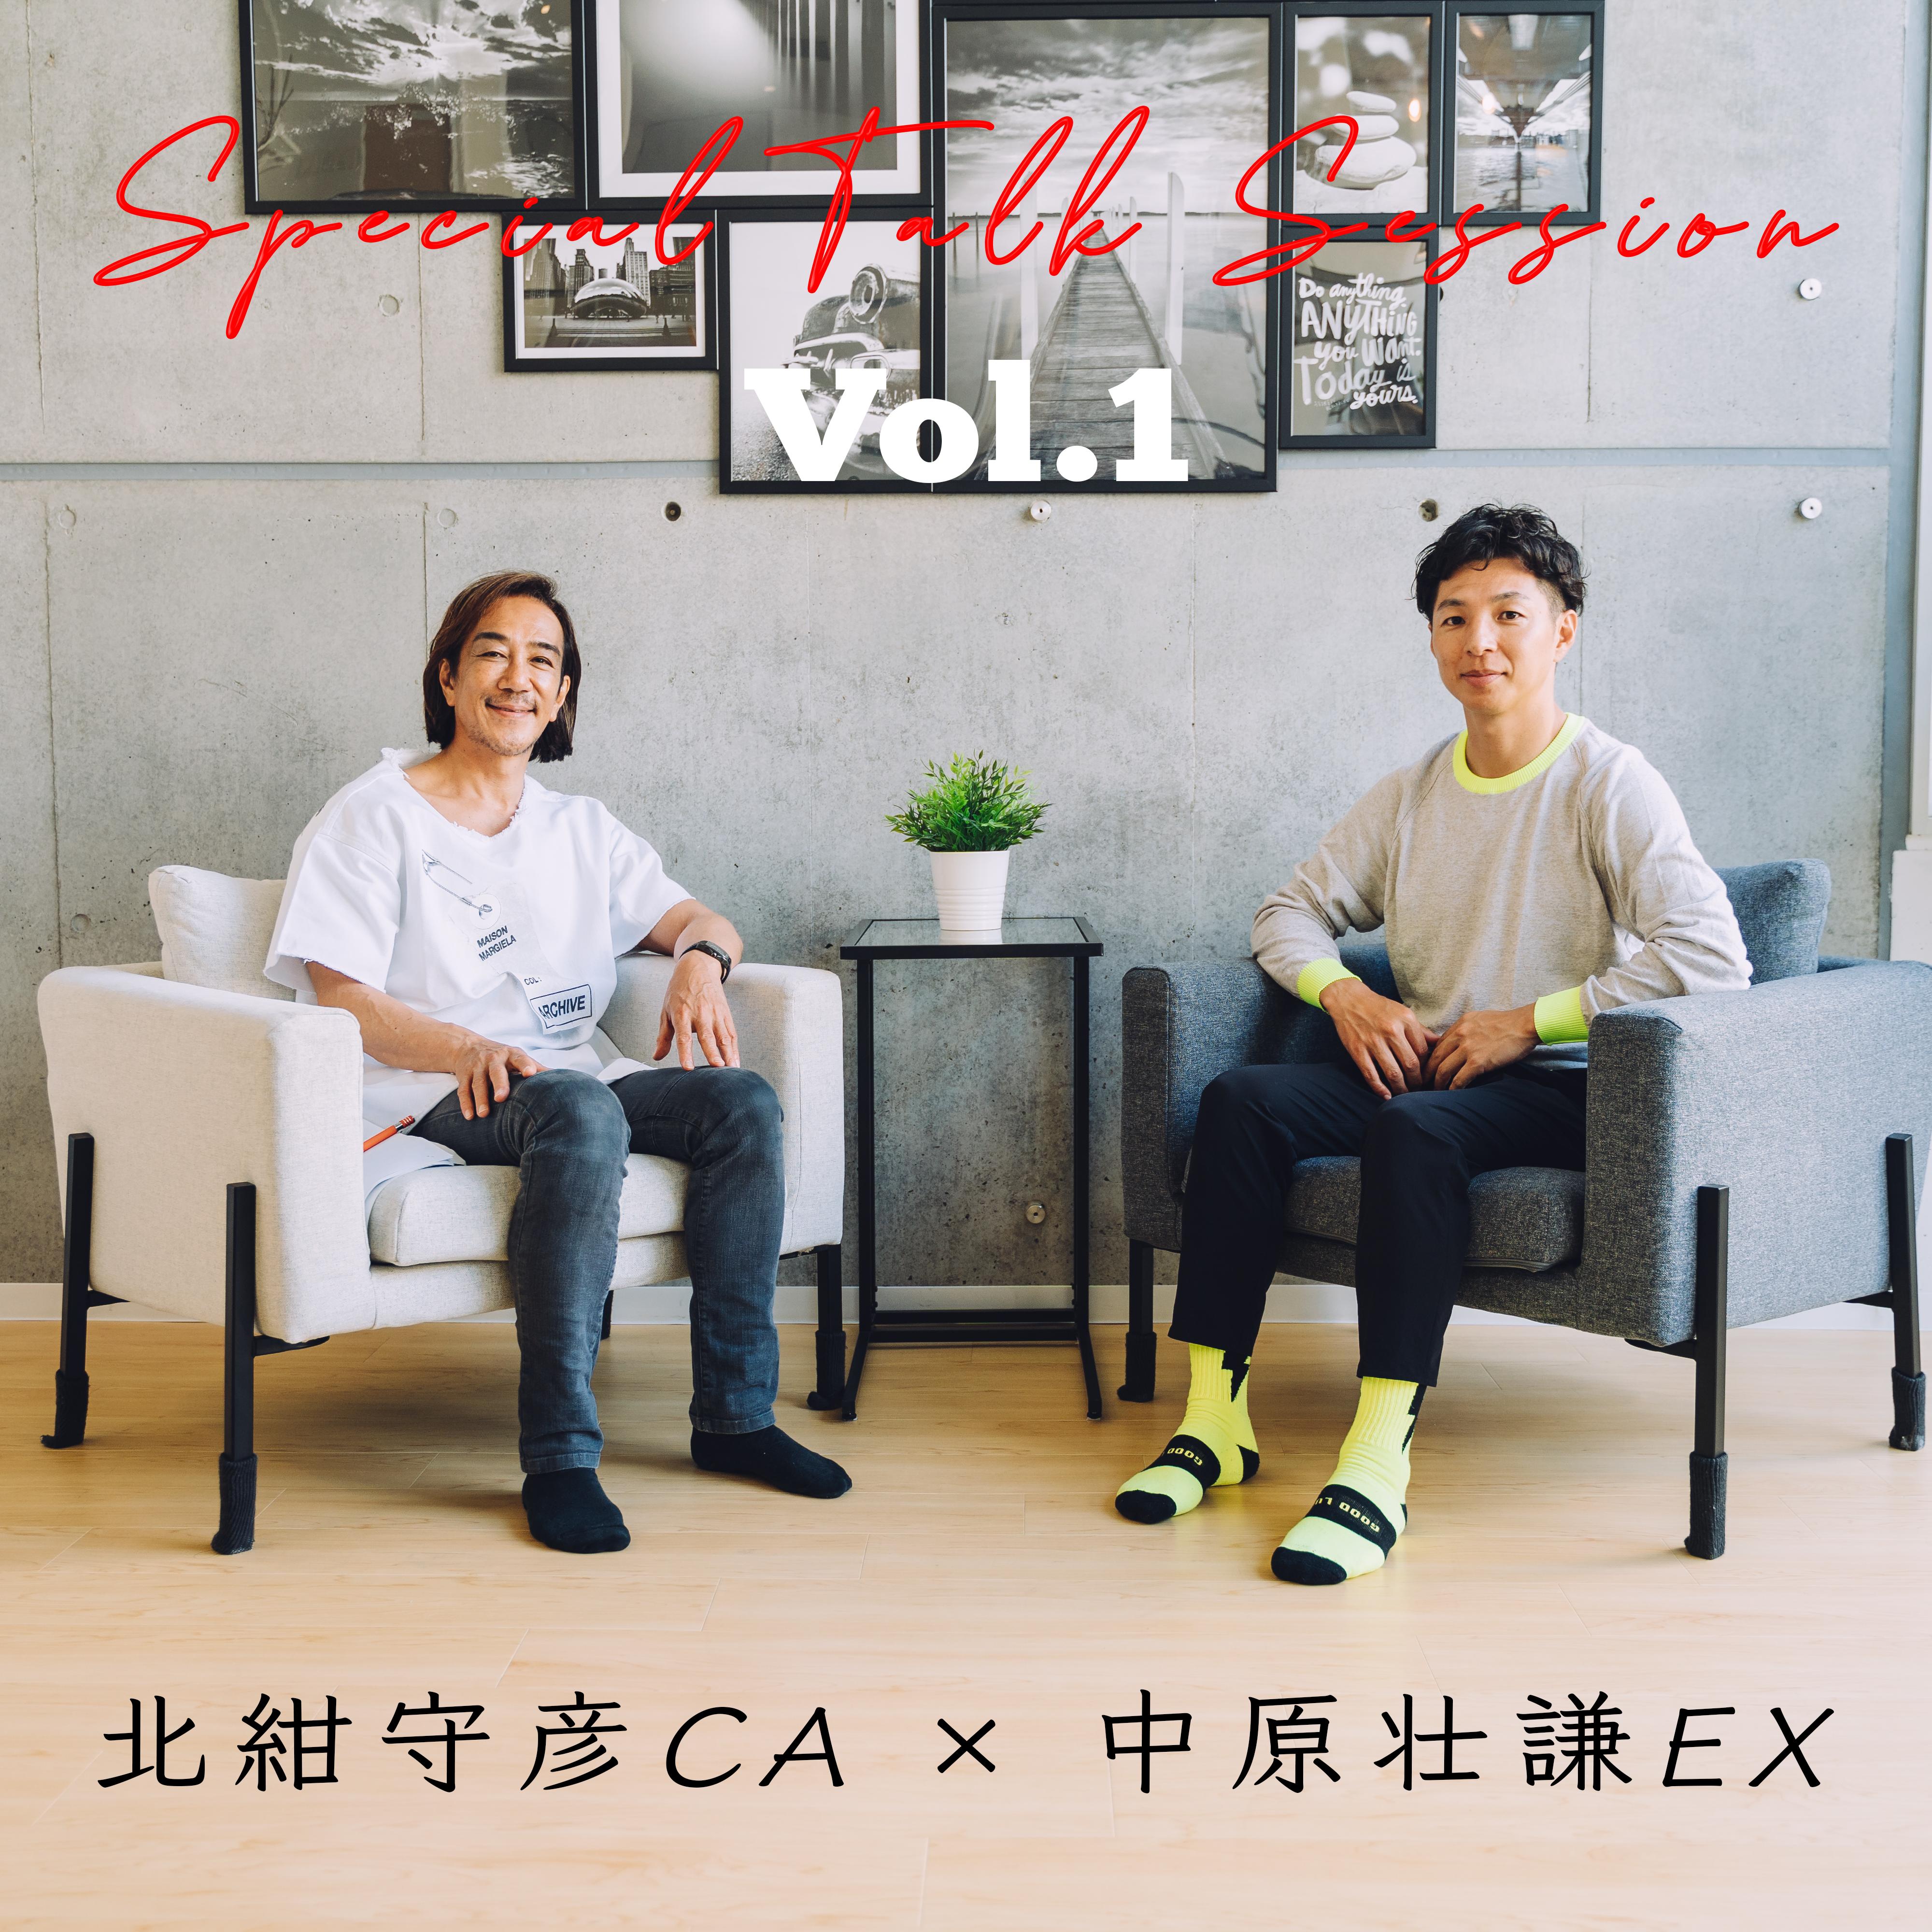 Special Talk Session 【中原壮謙EX✖️ 北紺守彦CA  】vol.1